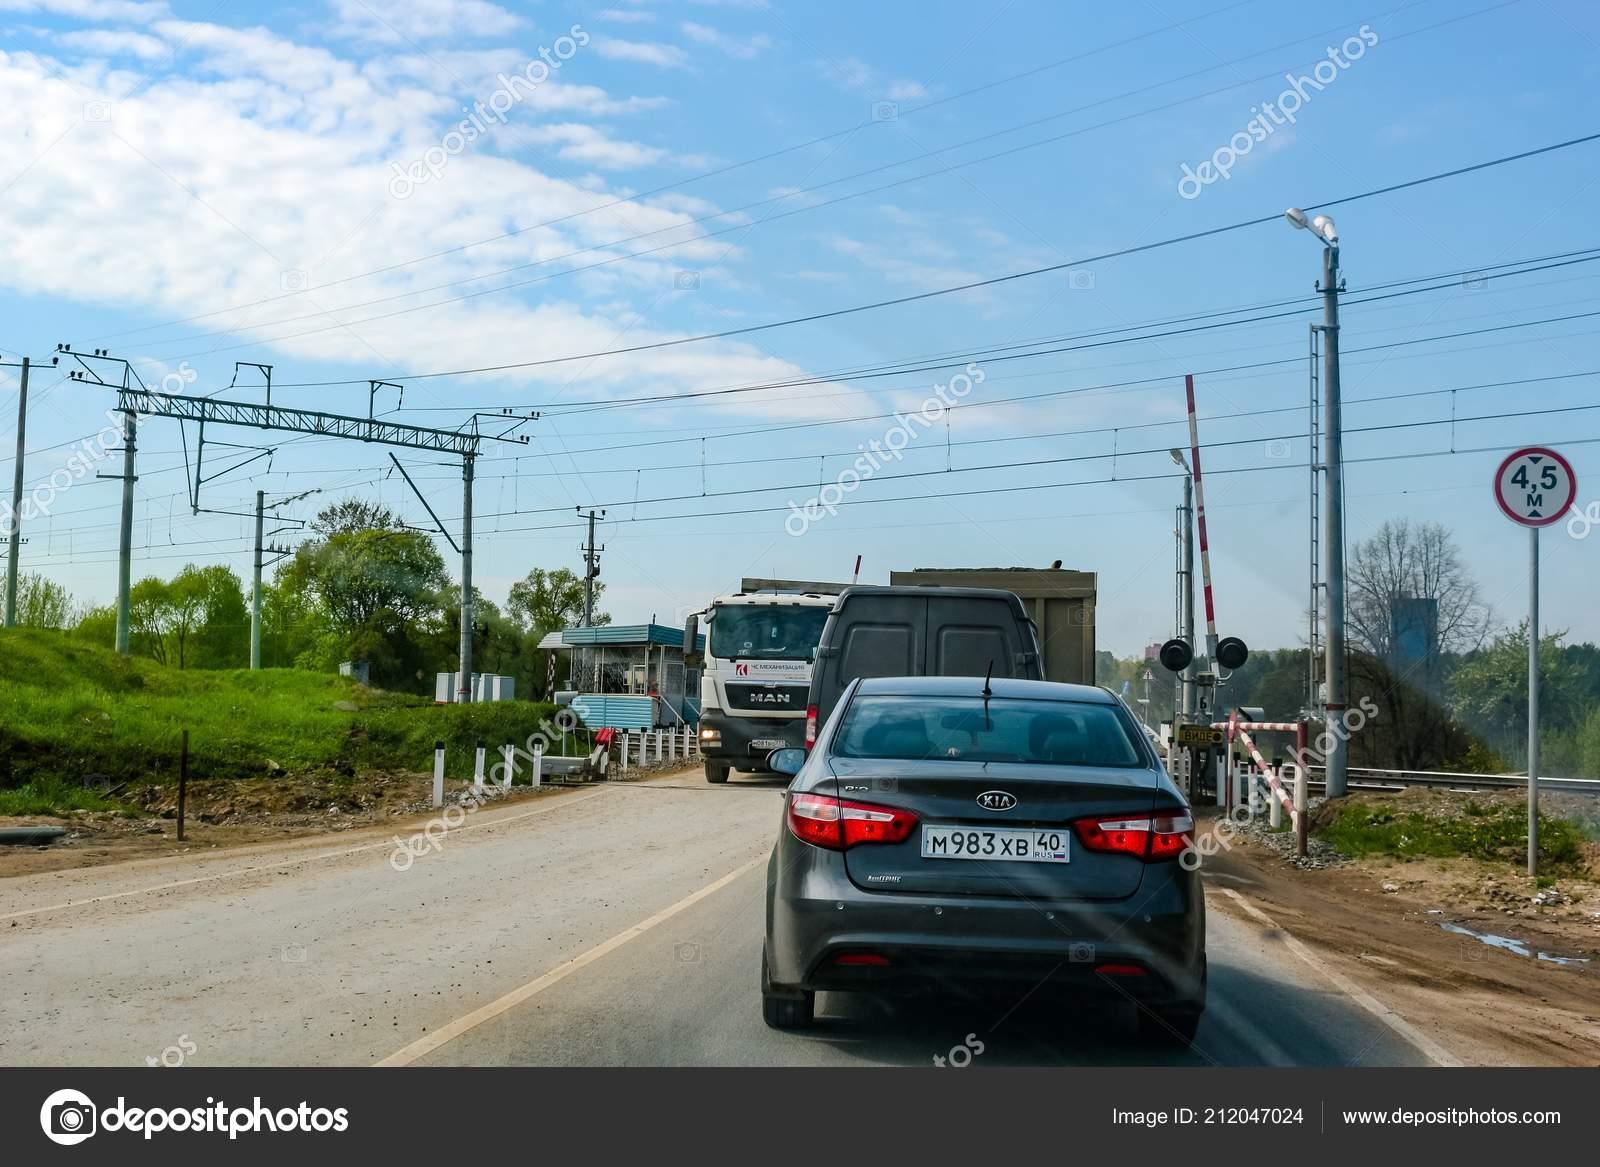 Maloyaroslavets Russia May 2016 Railroad Crossing Entrance